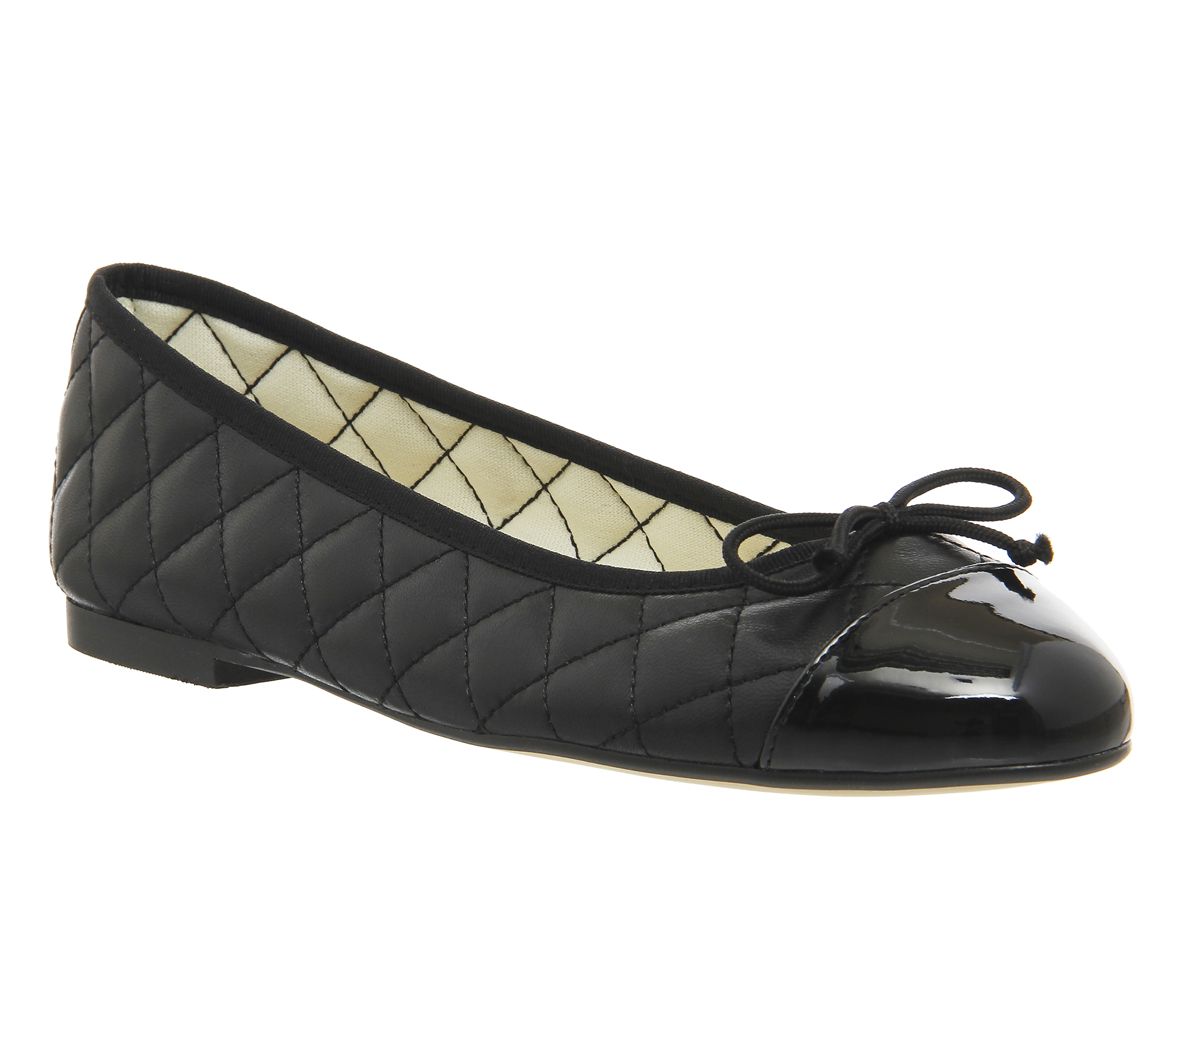 382b31e58 Sentinel Womens Office Cecilia Toe Cap Ballet Pumps BLACK LEATHER PATENT  Flats